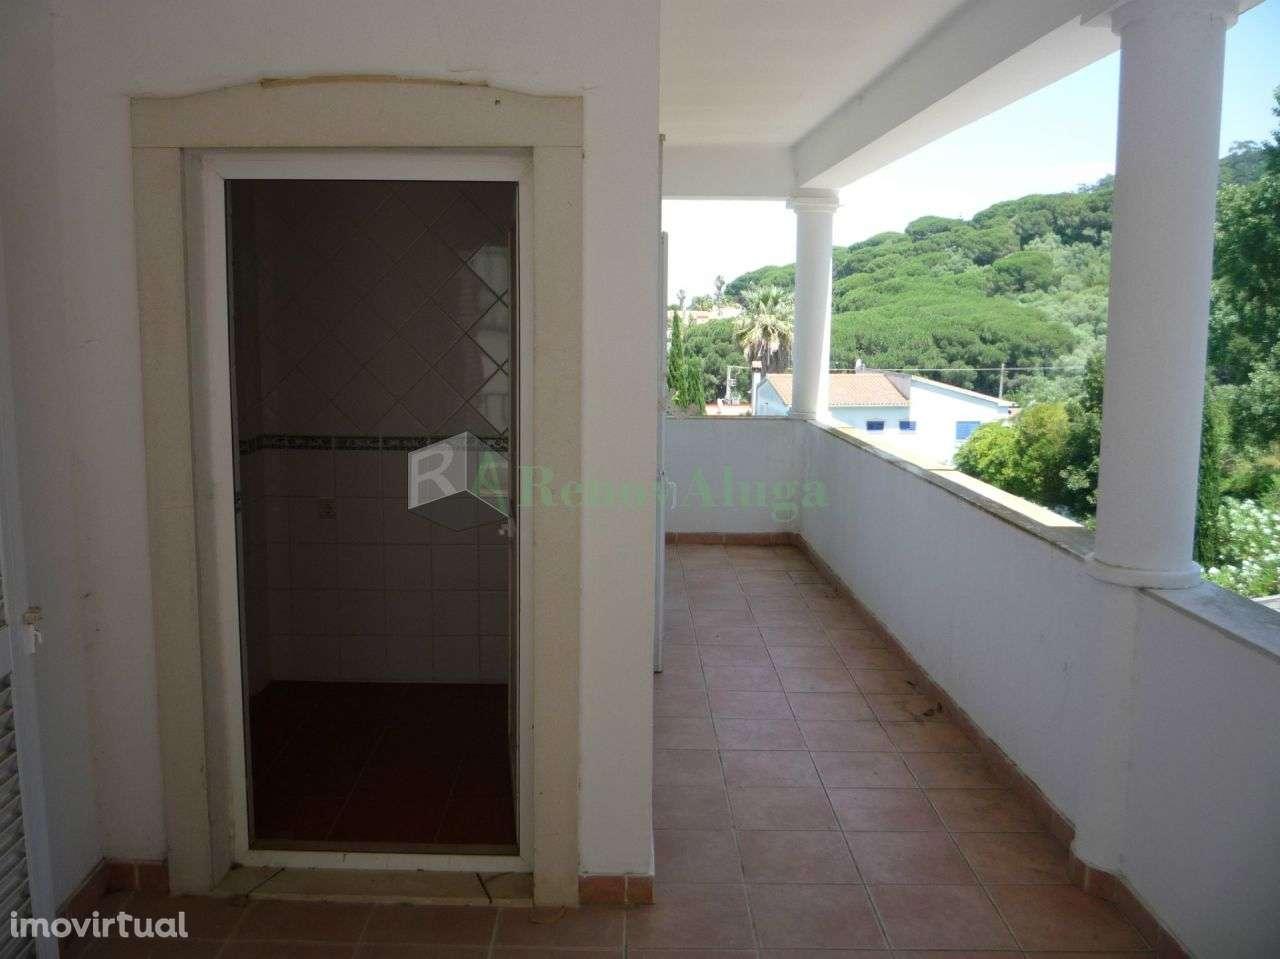 Moradia para arrendar, Quinta do Anjo, Setúbal - Foto 8